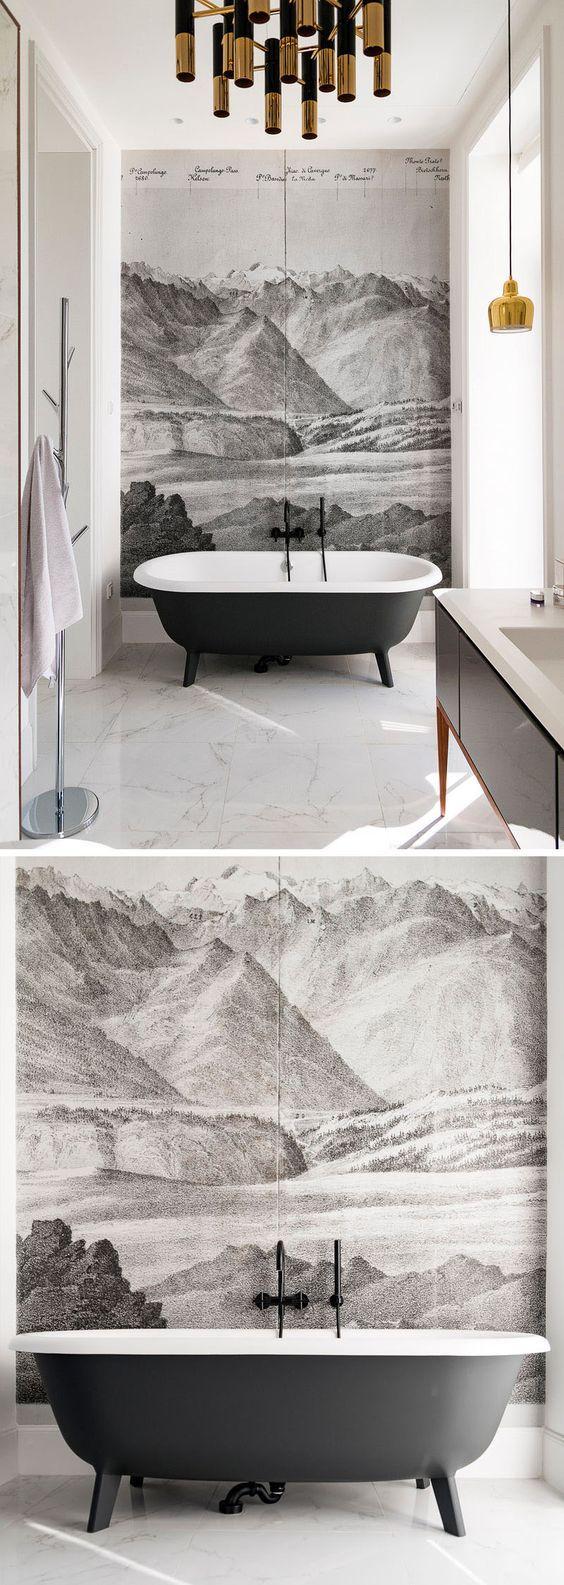 Seeing The World In Black And White Bathtub Decor Bathroom Design Bath Design